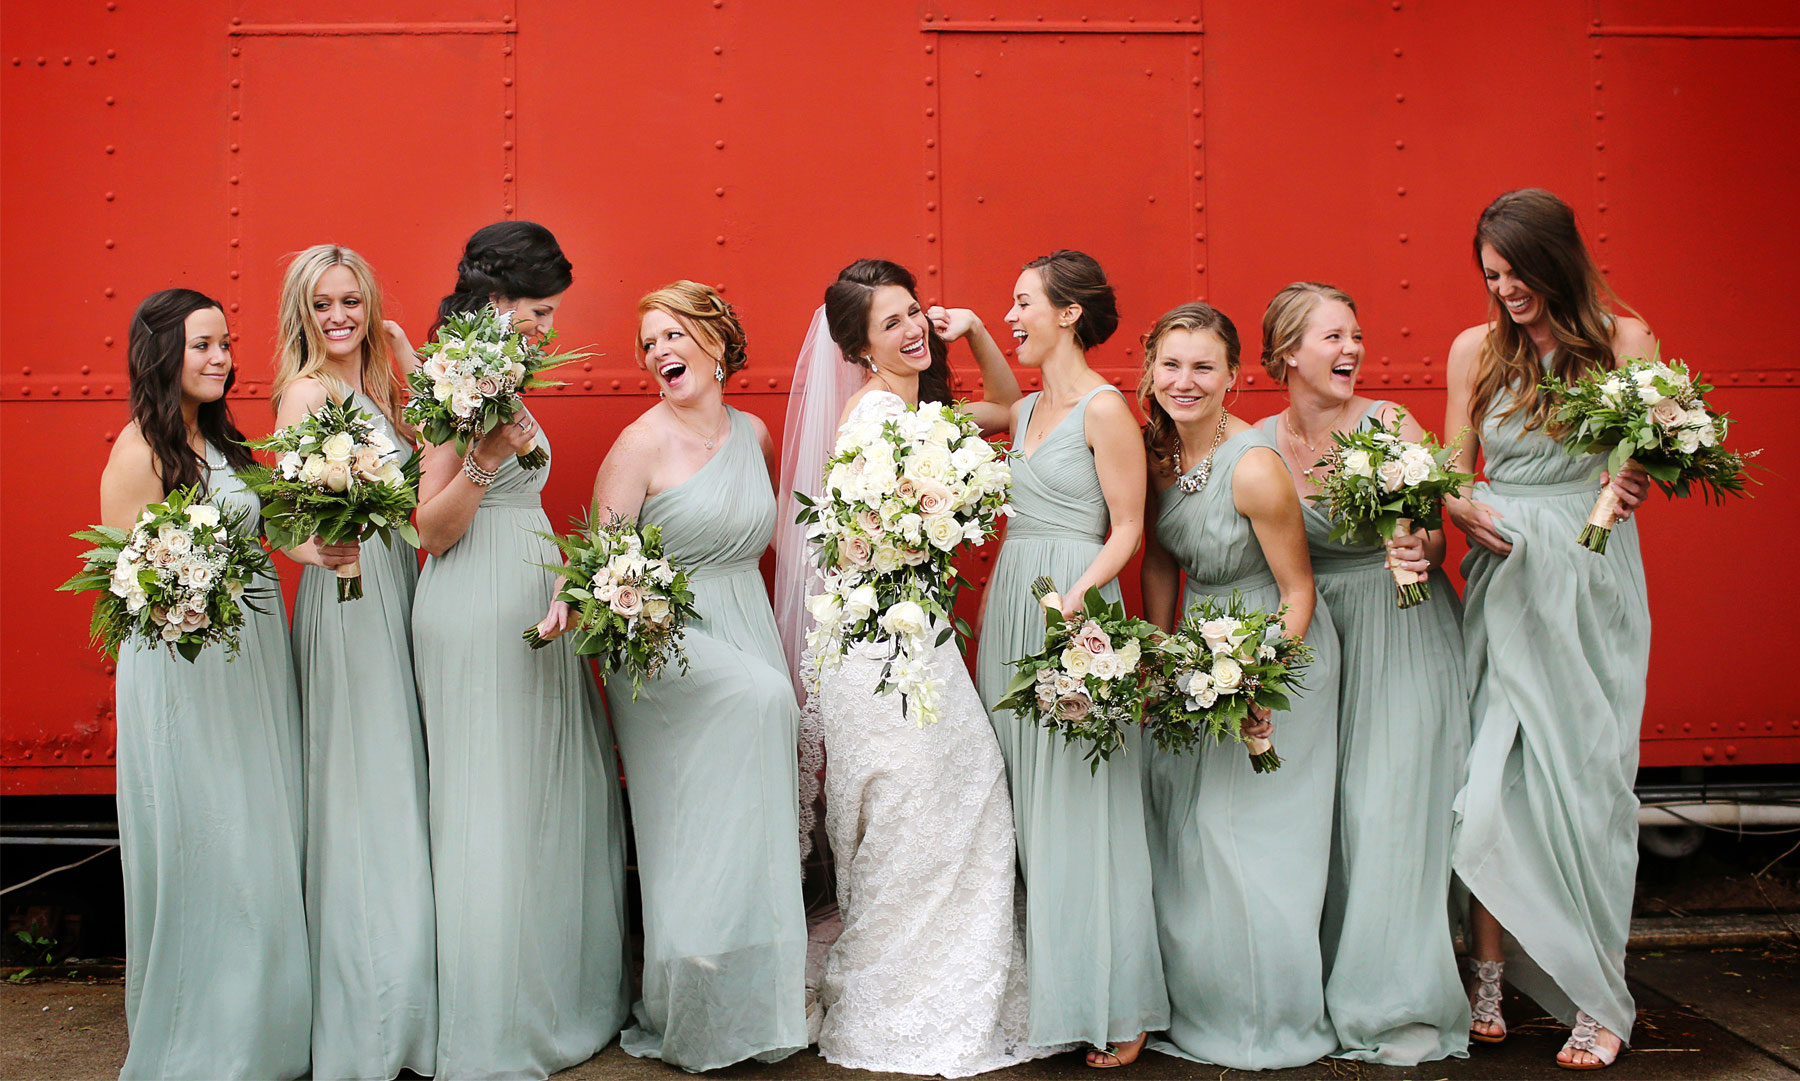 10-Stillwater-Minnesota-Wedding-Photography-by-Vick-Photography--Bridesmaids-Alicia-&-Cole.jpg